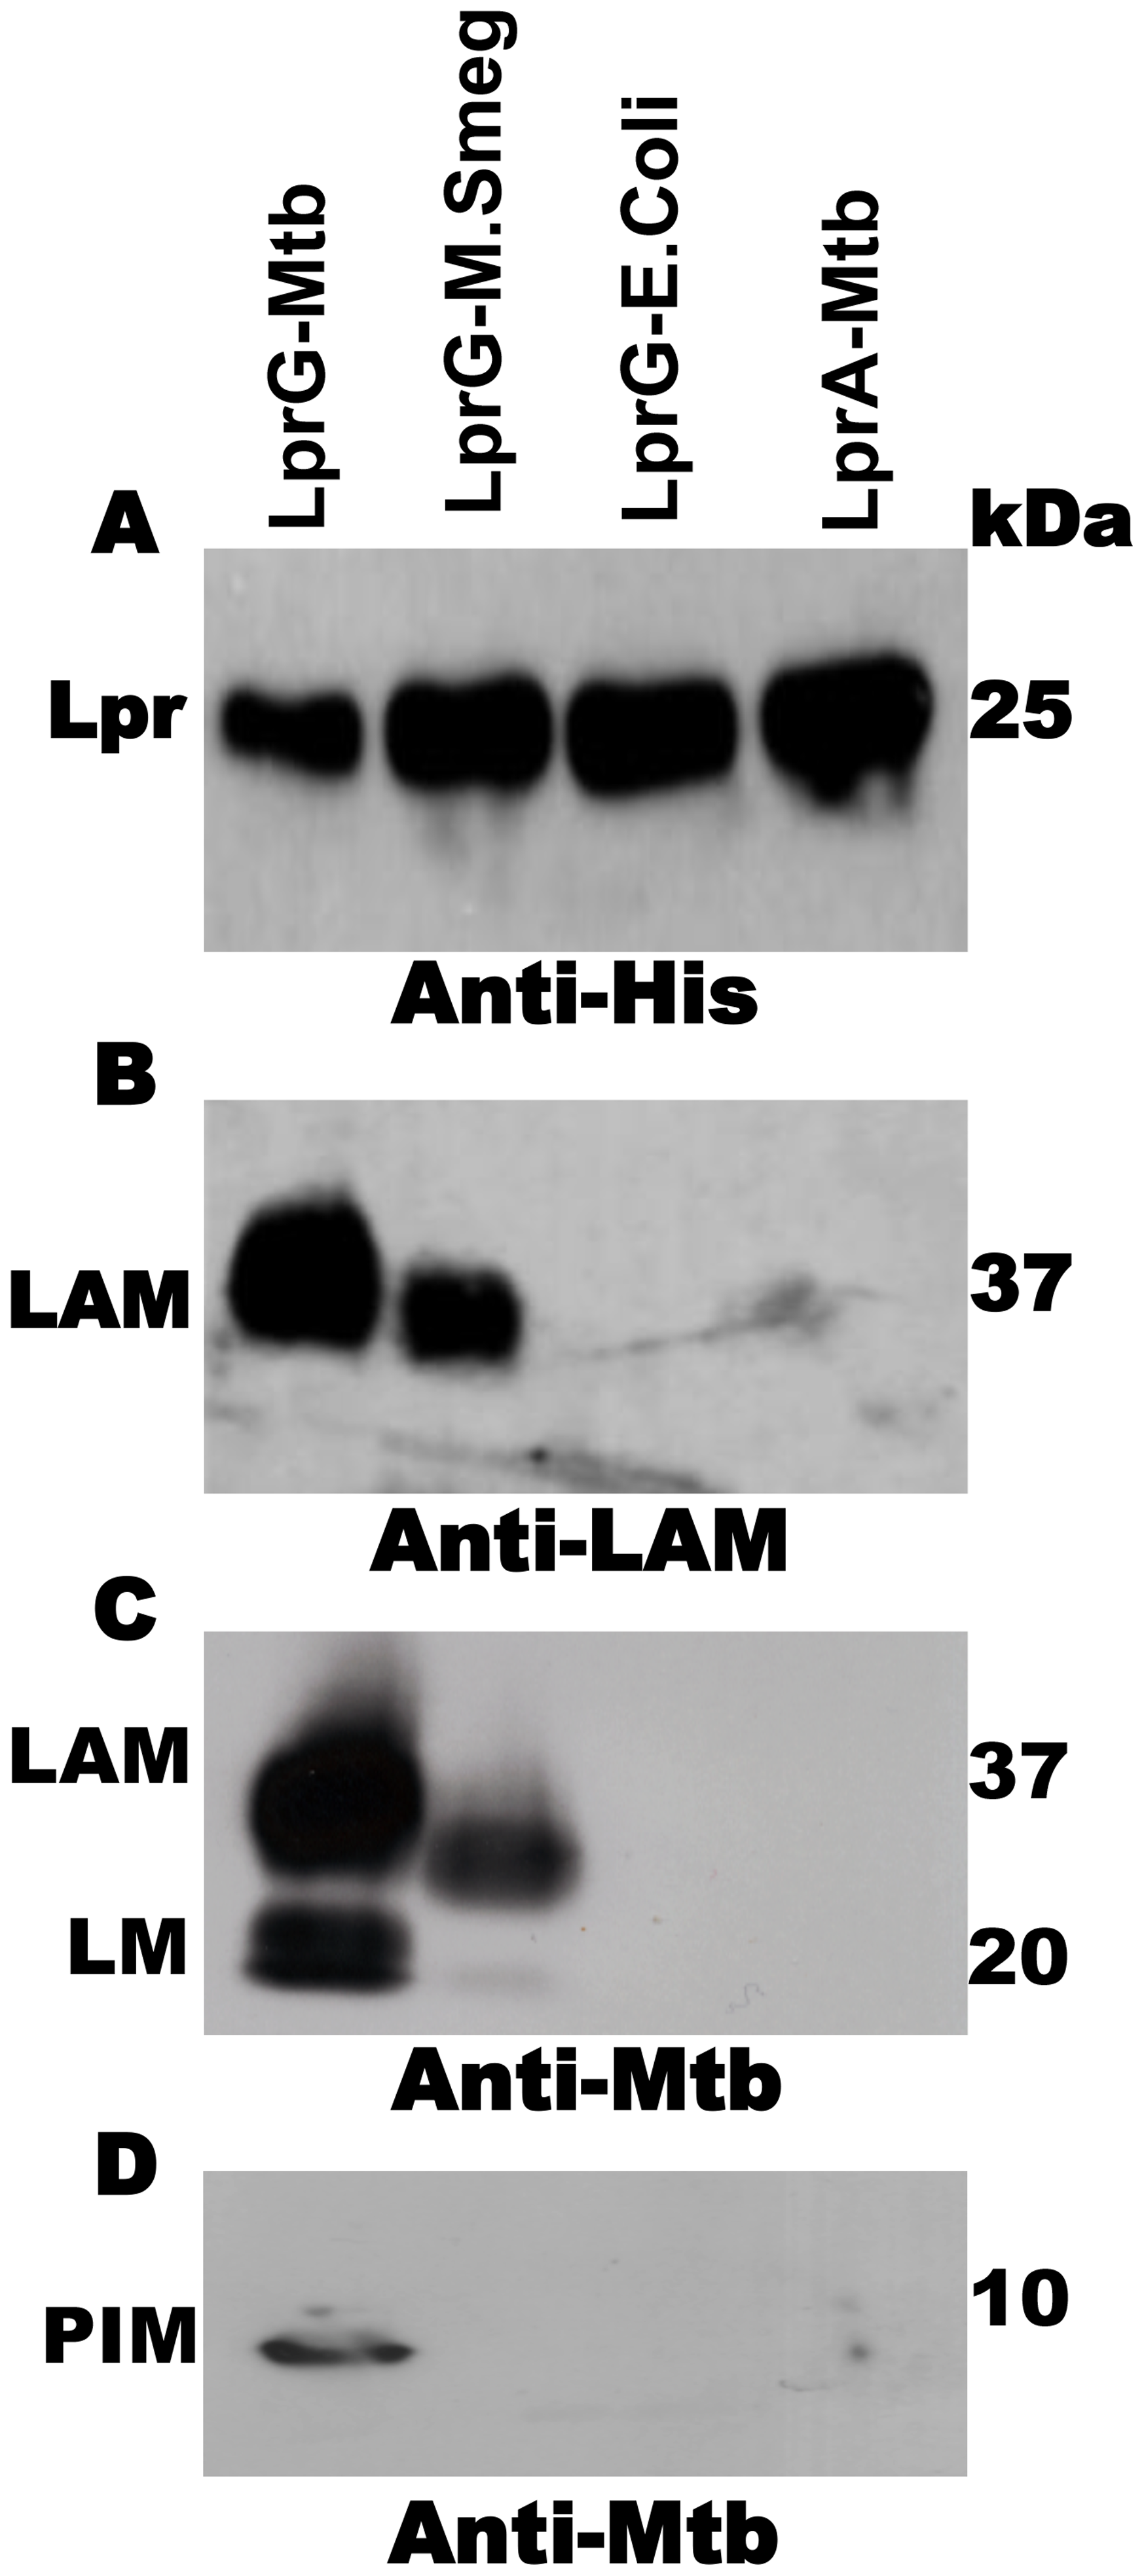 Acylated LprG binds lipoglycans in Mtb.